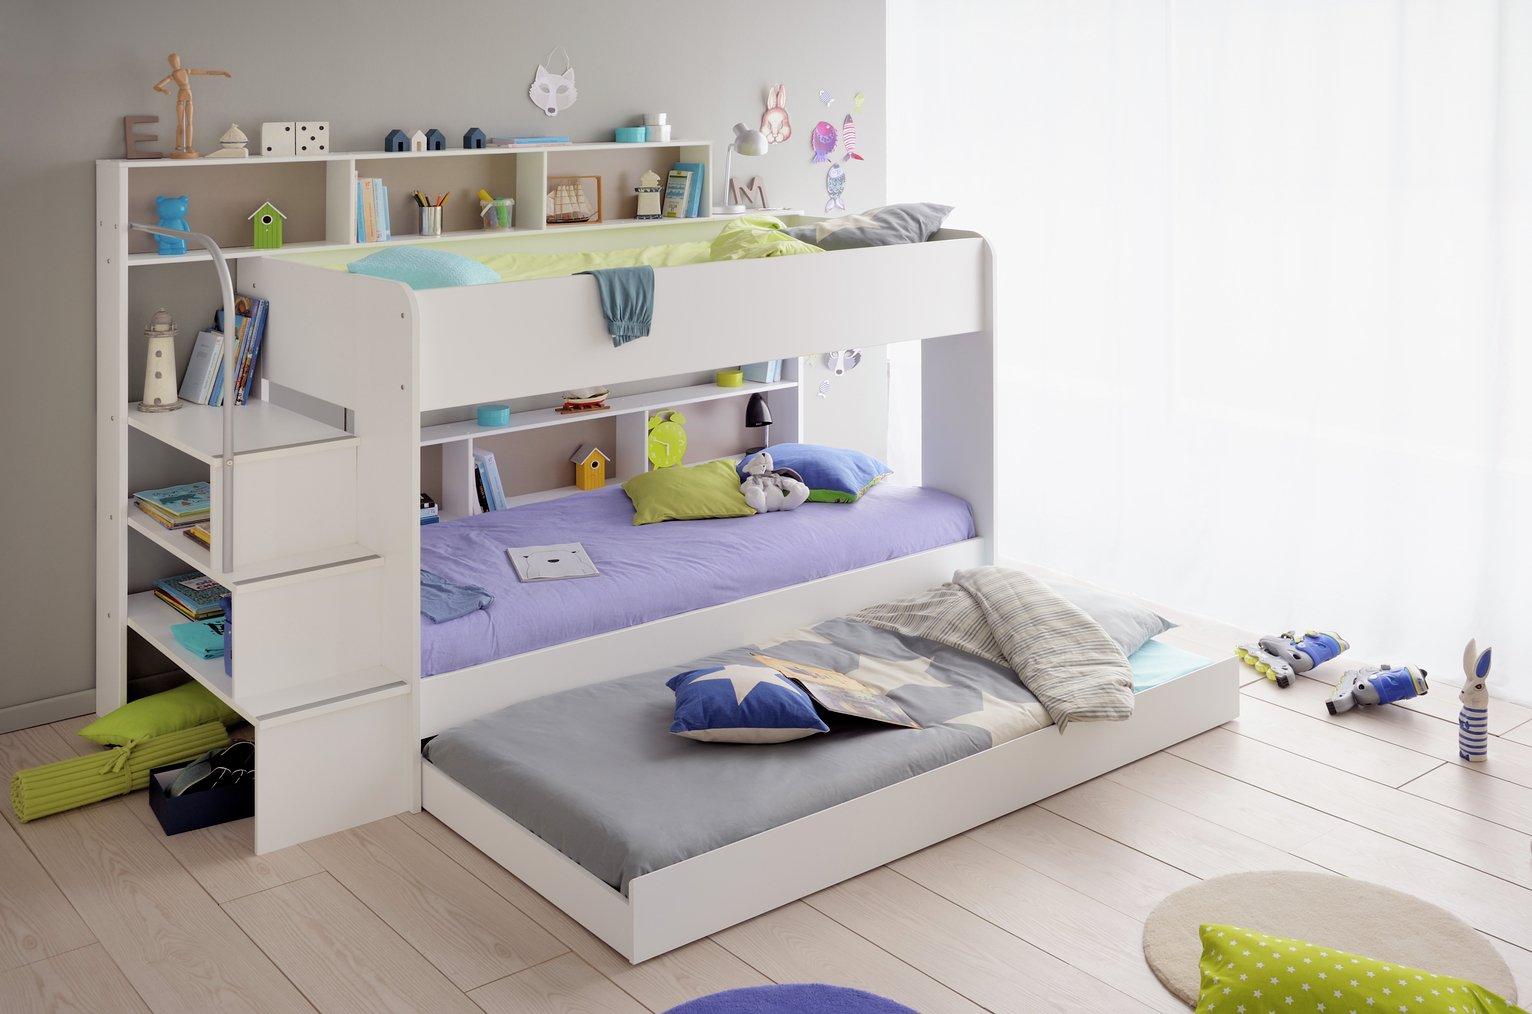 Parisot Bibop Bunk Bed with Step Storage Drawer - White